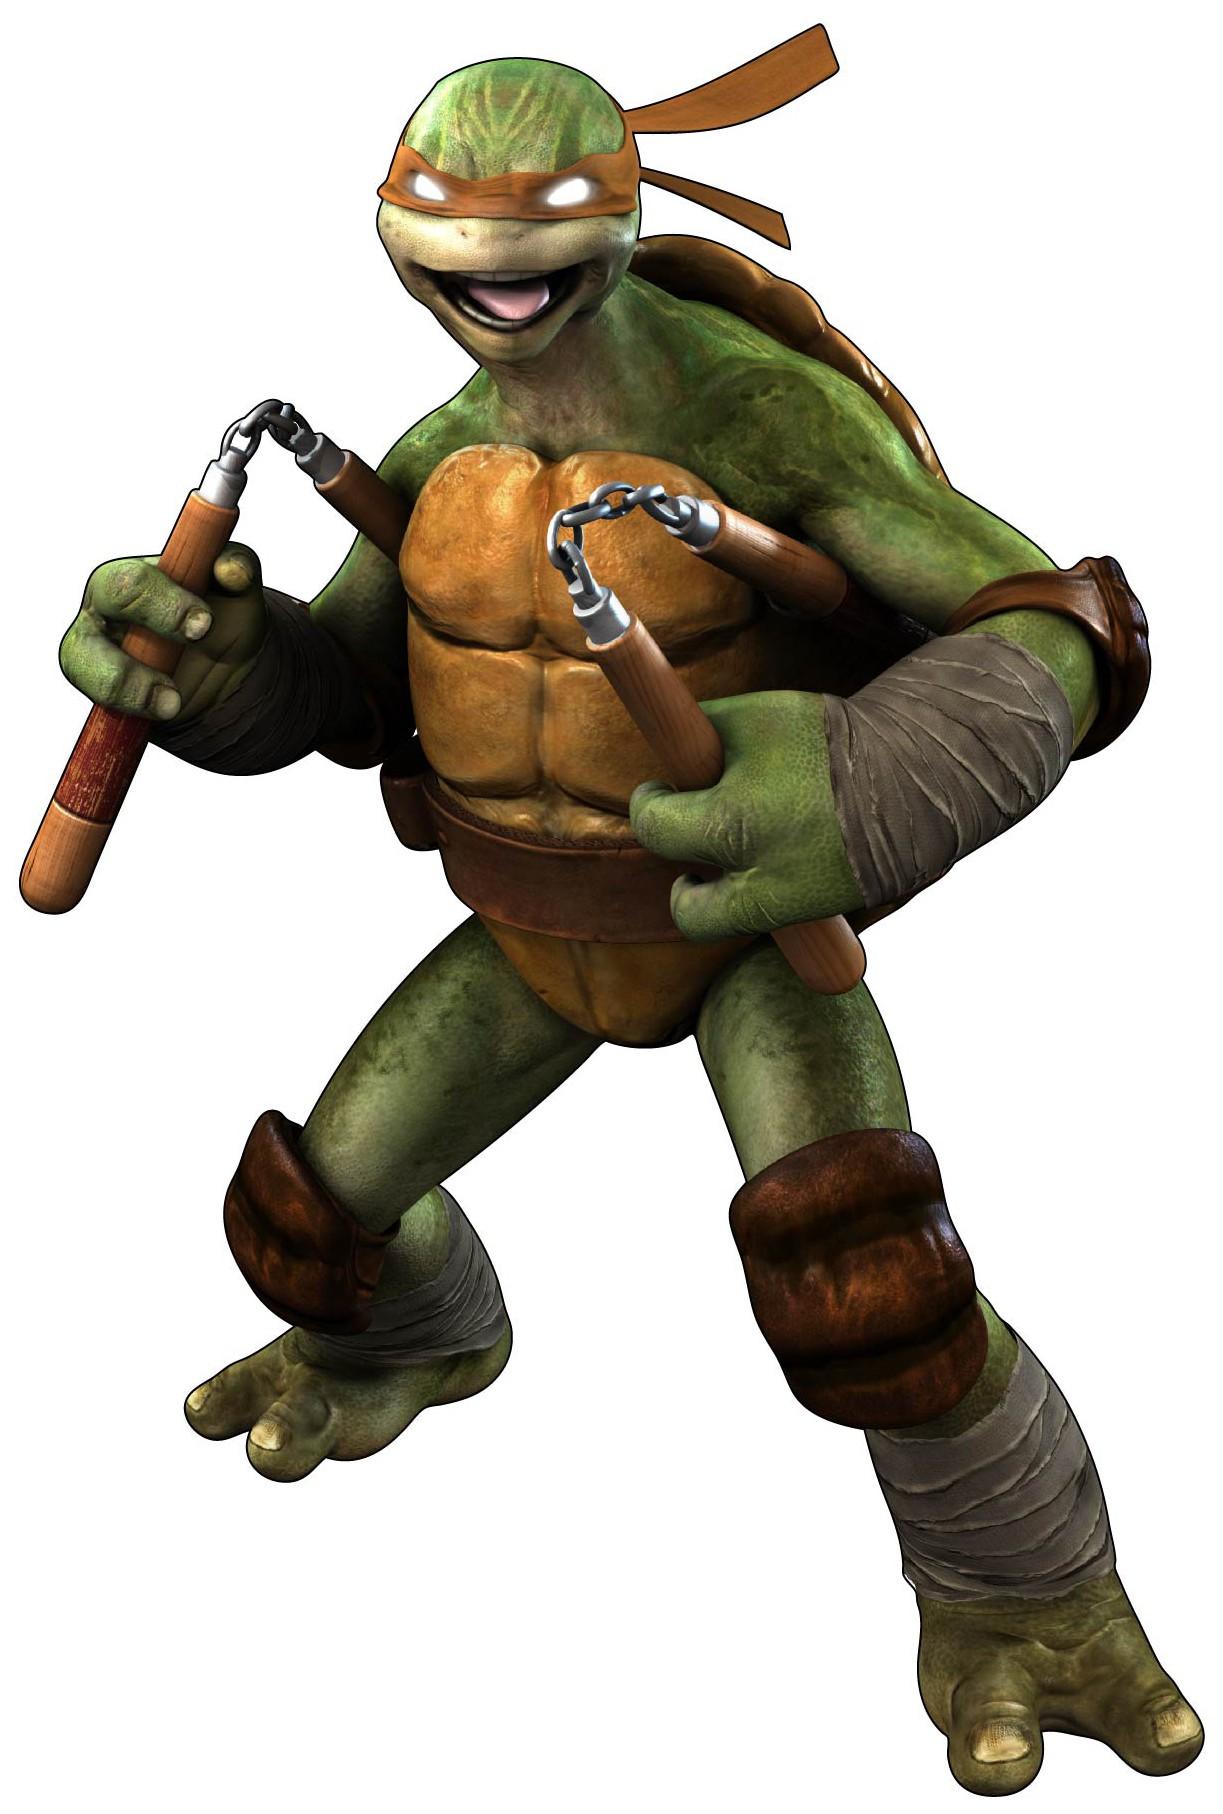 Frais image de tortue ninja a imprimer - Image de tortue ninja ...